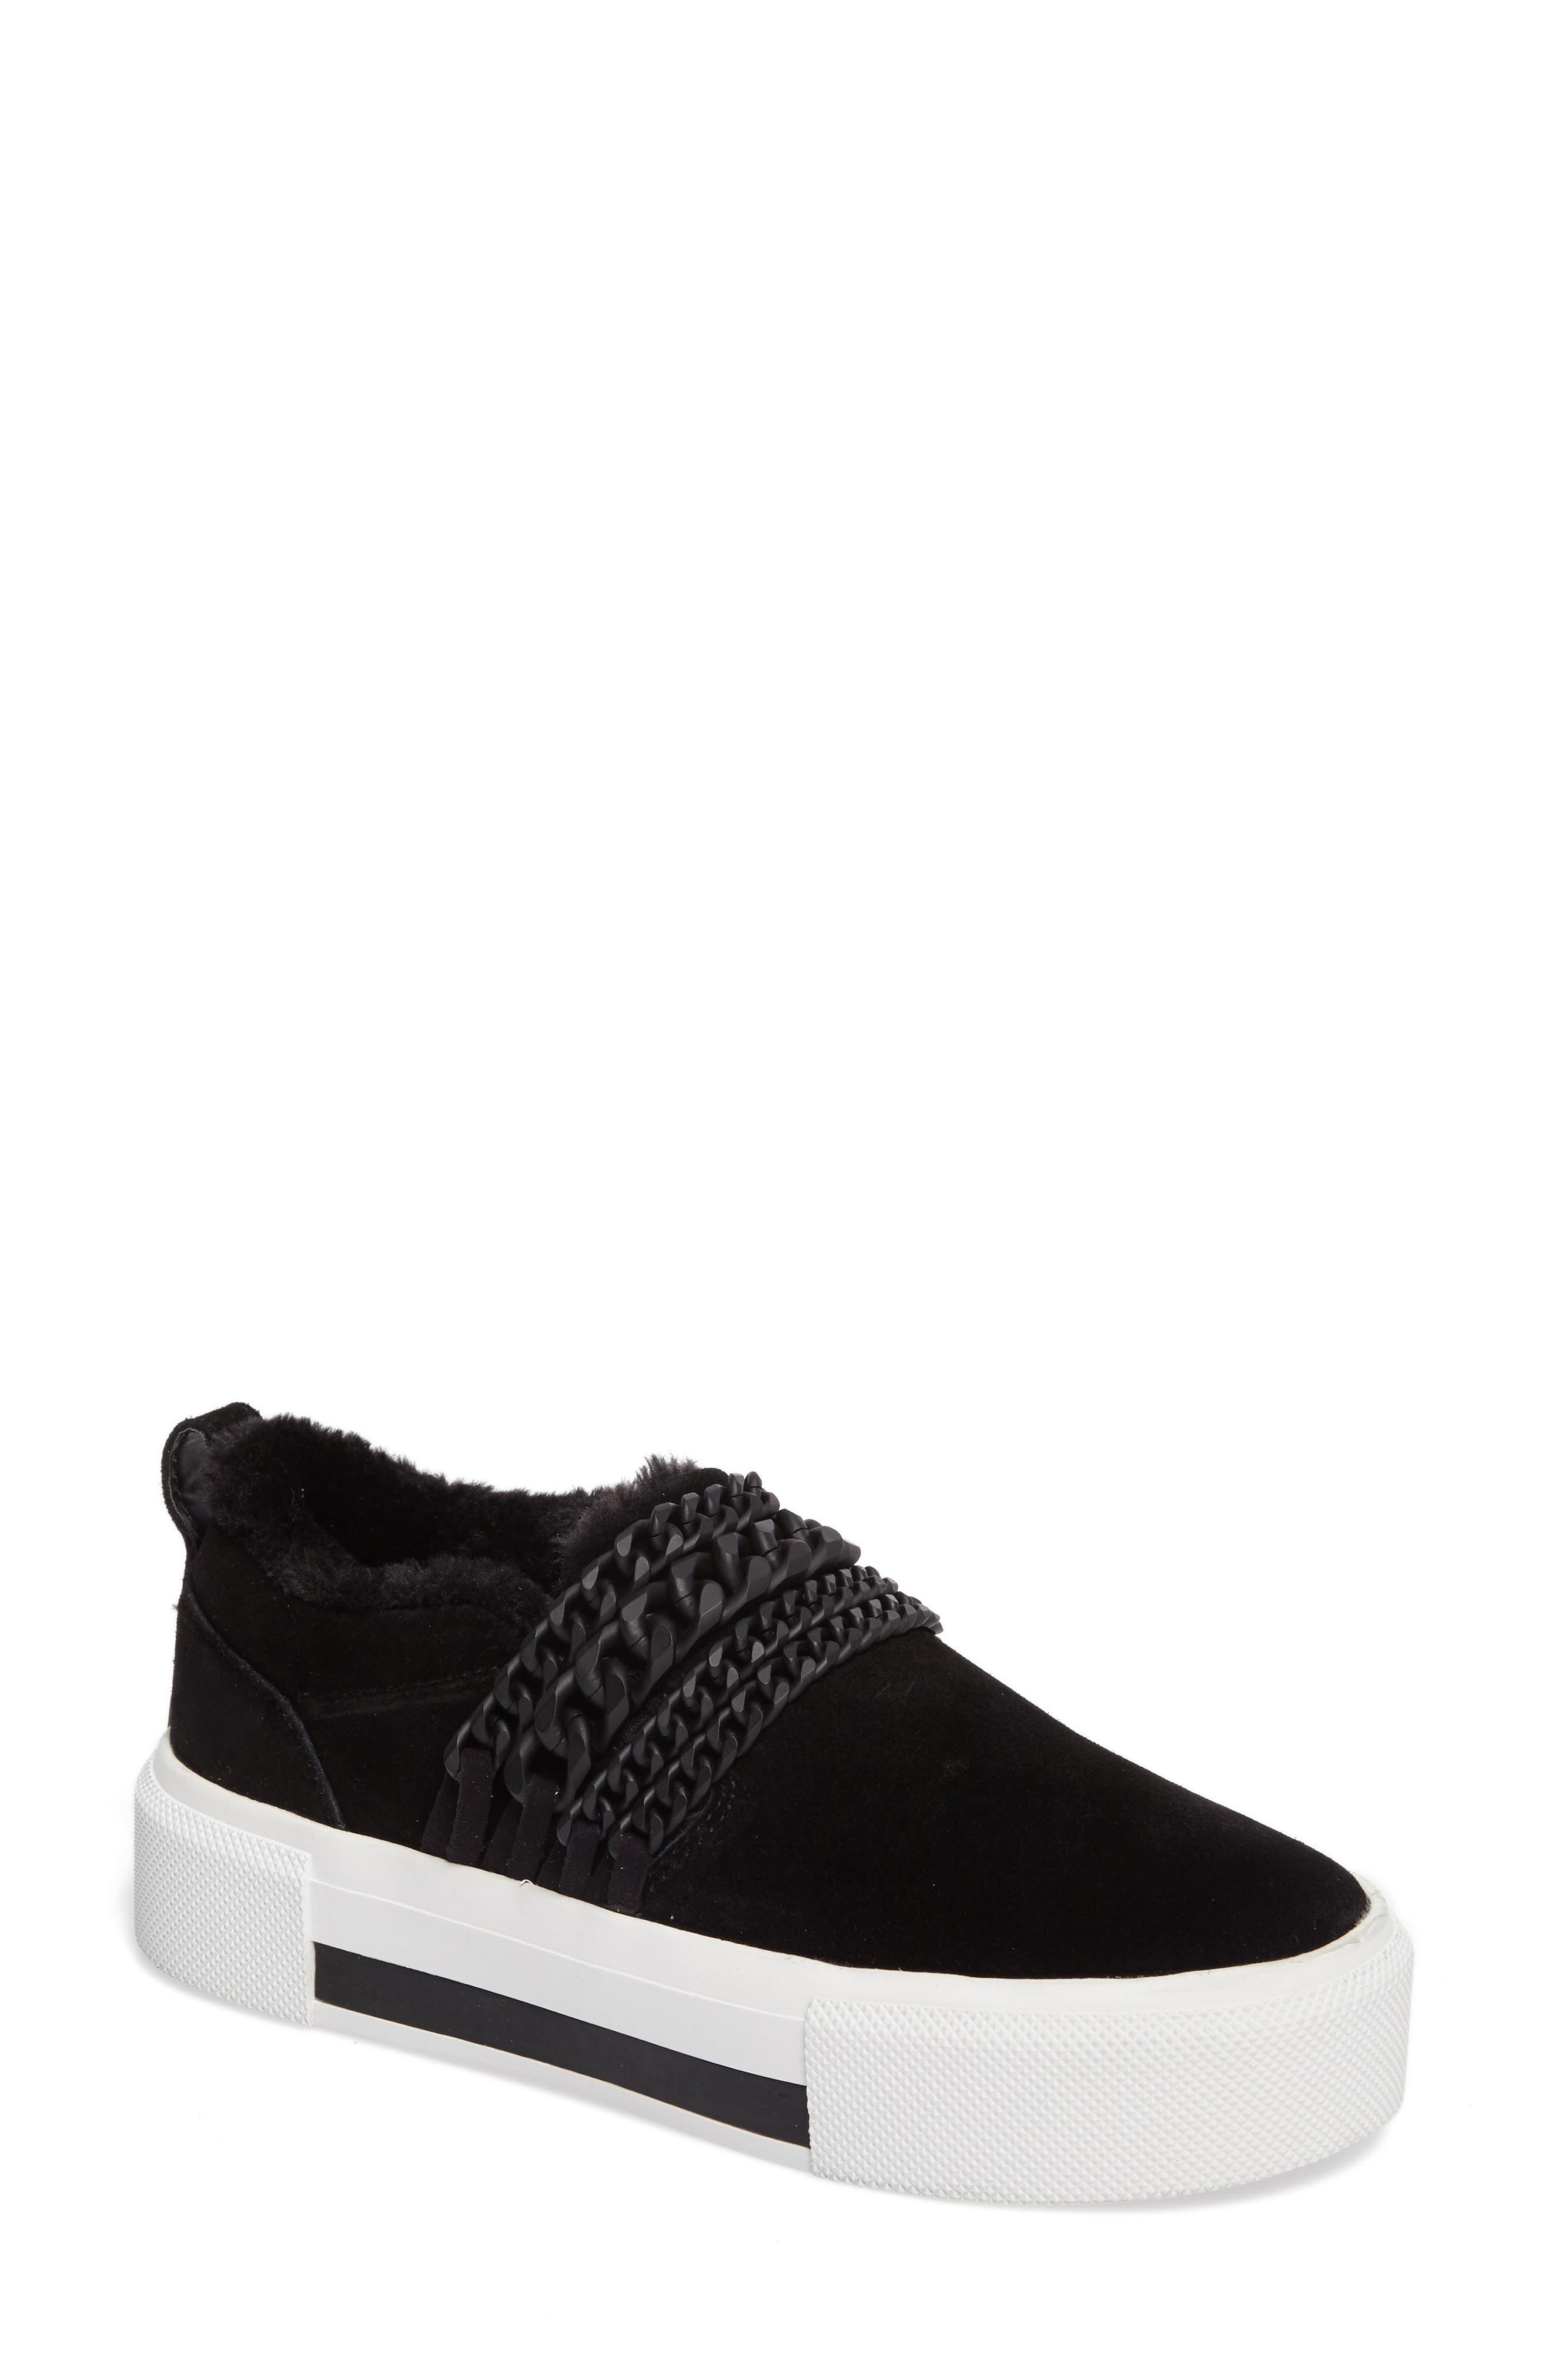 Tory Platform Sneaker,                         Main,                         color, Black